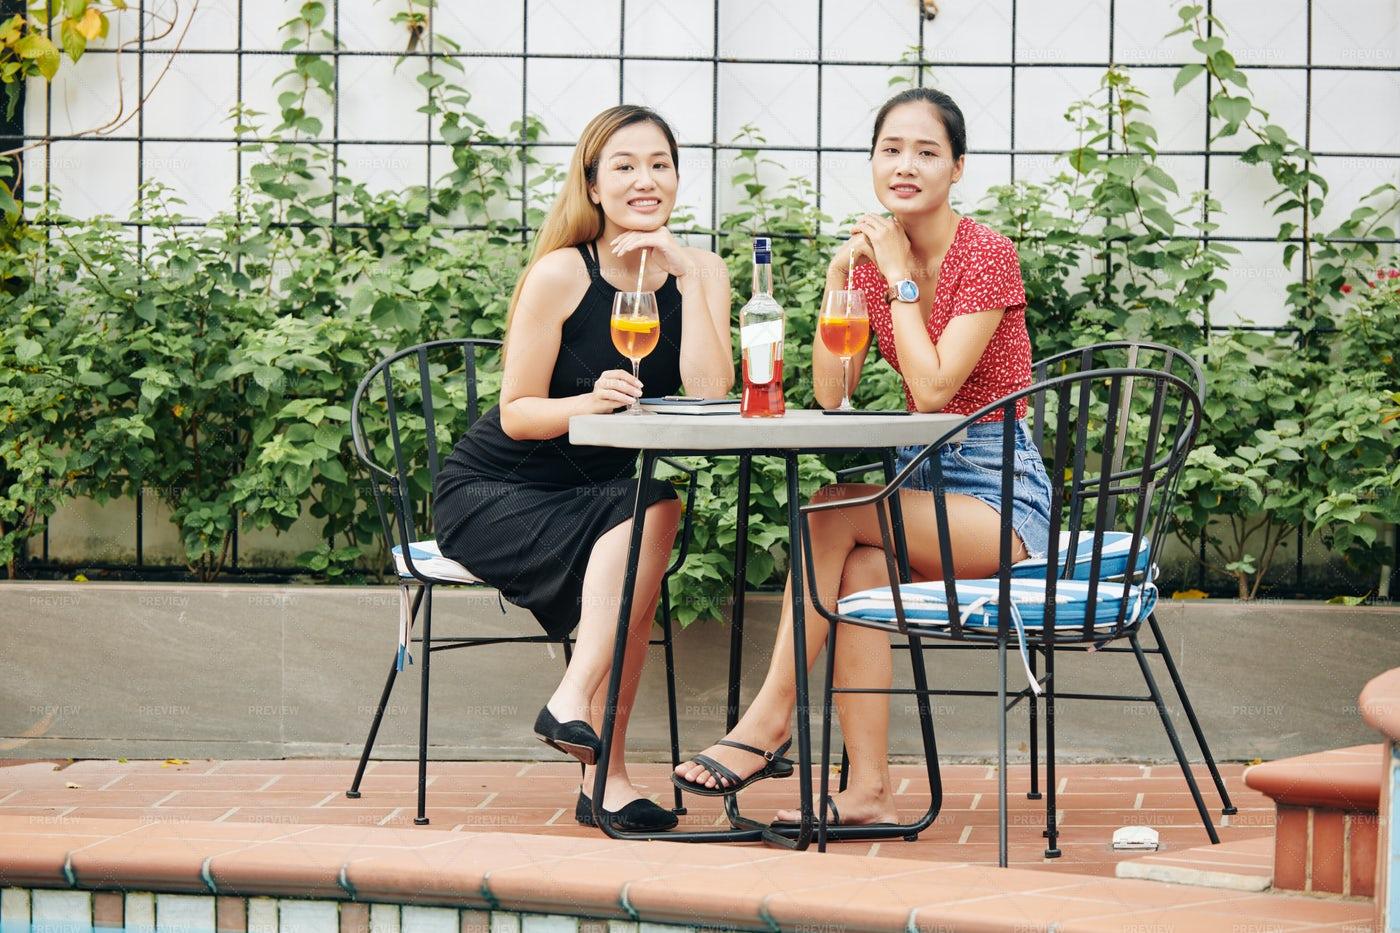 Beautiful Women Drinking Wine In Cafe: Stock Photos